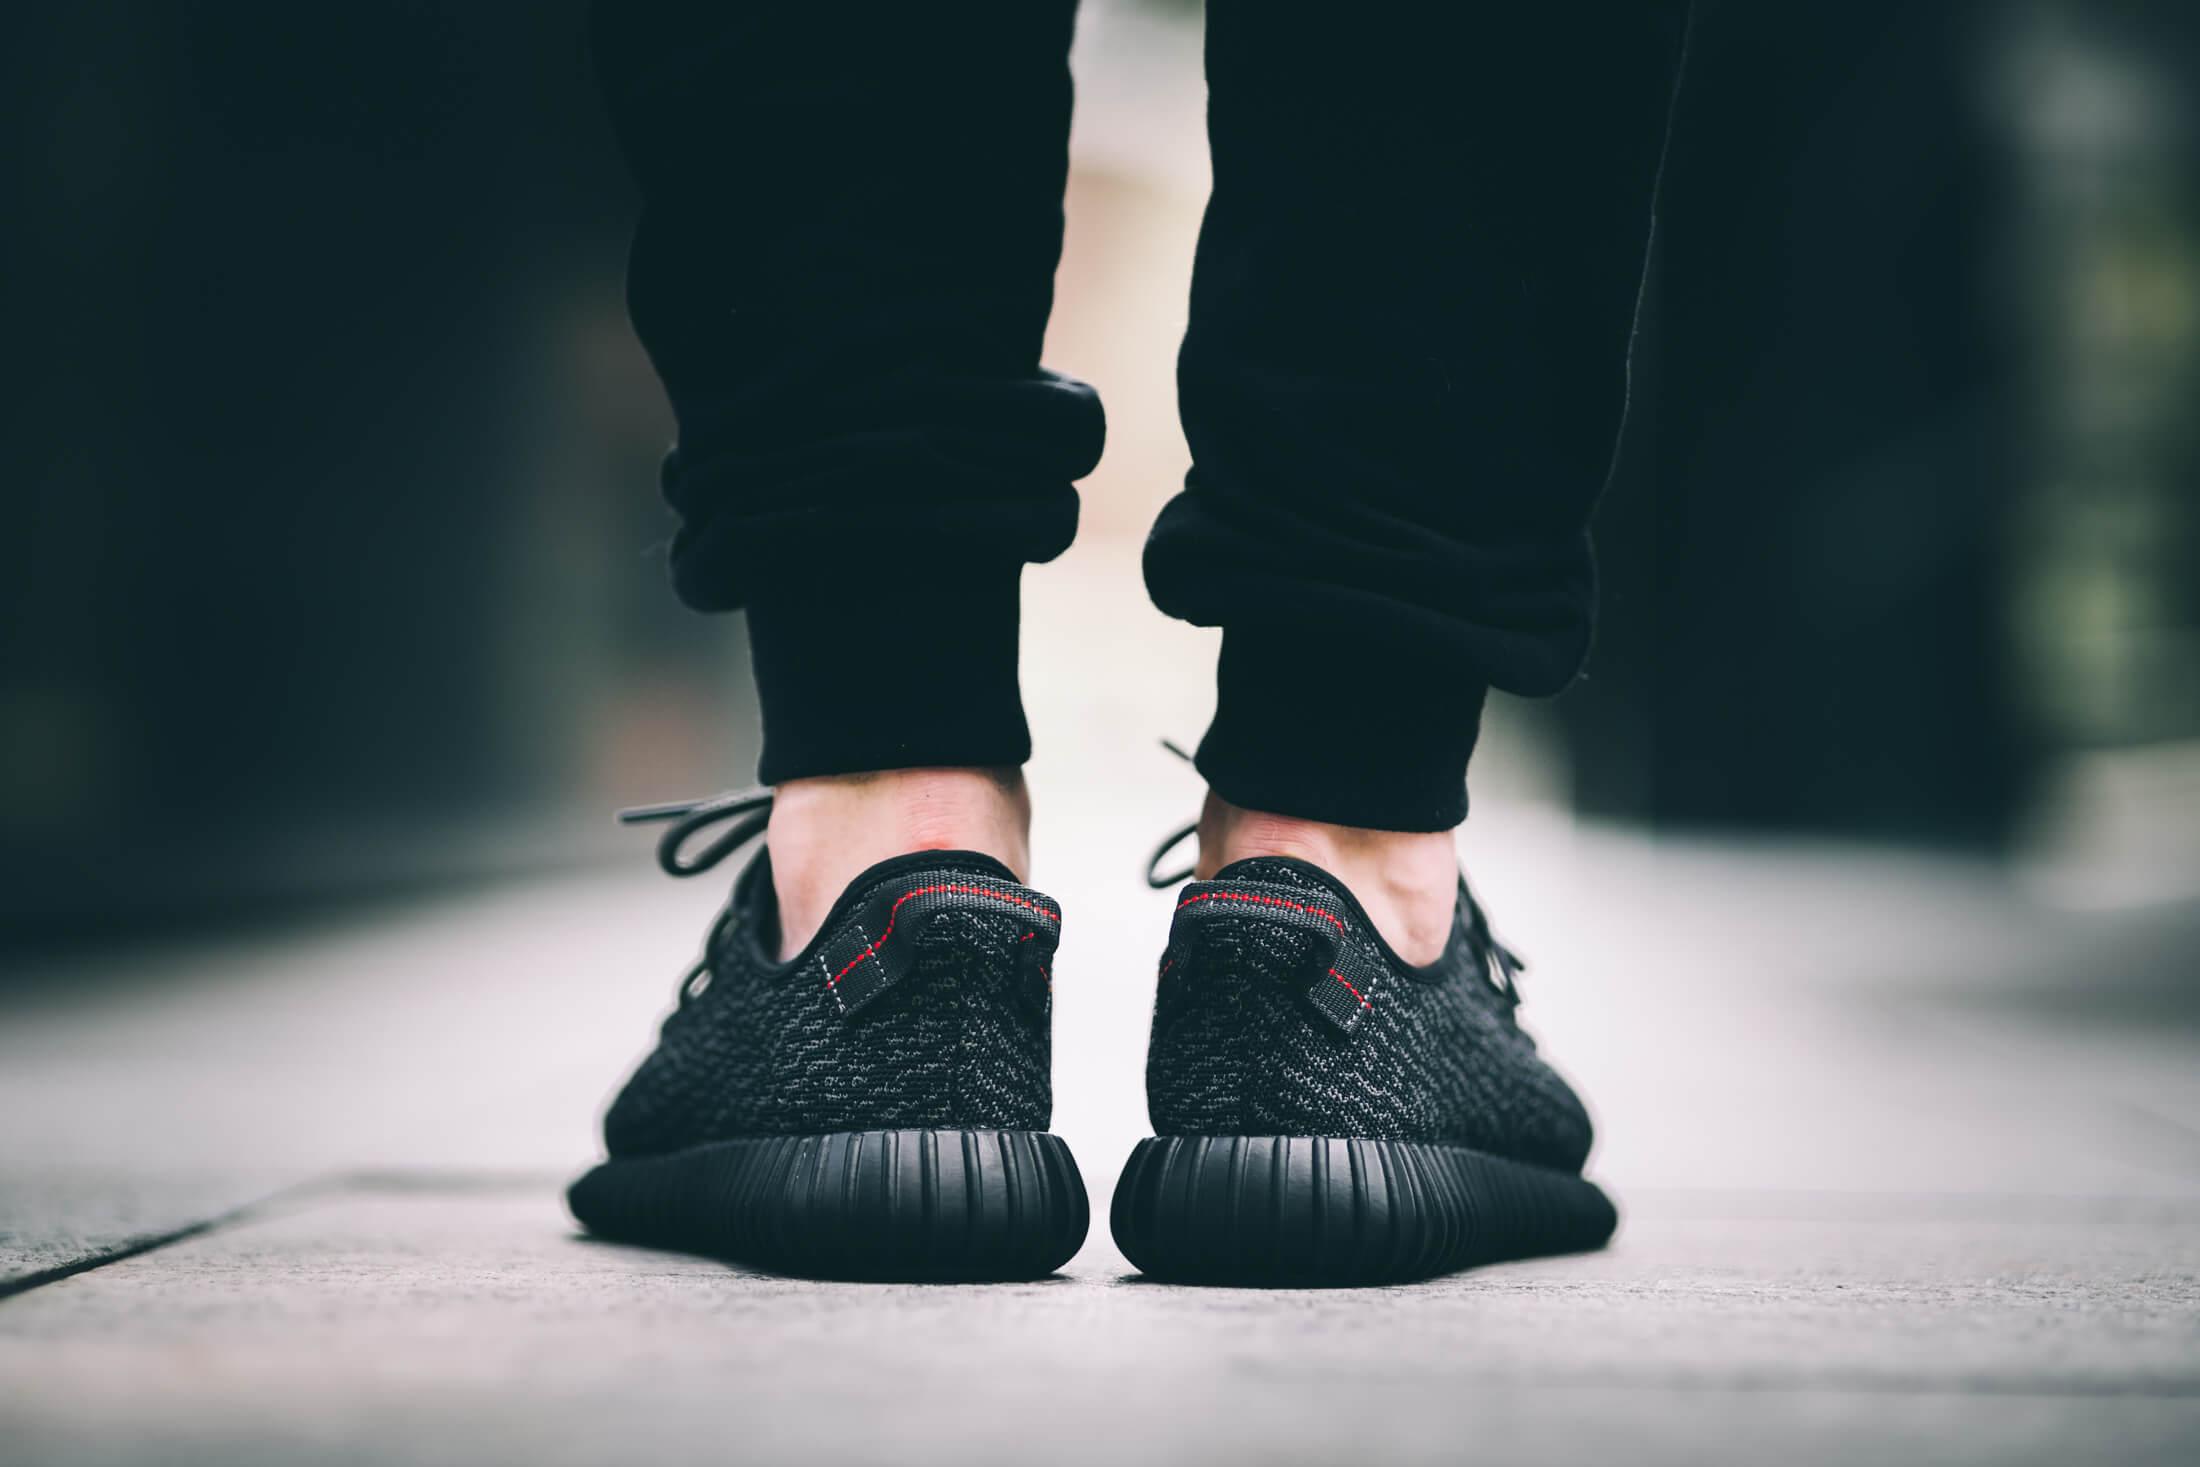 adidas Yeezy 350 Boost Black